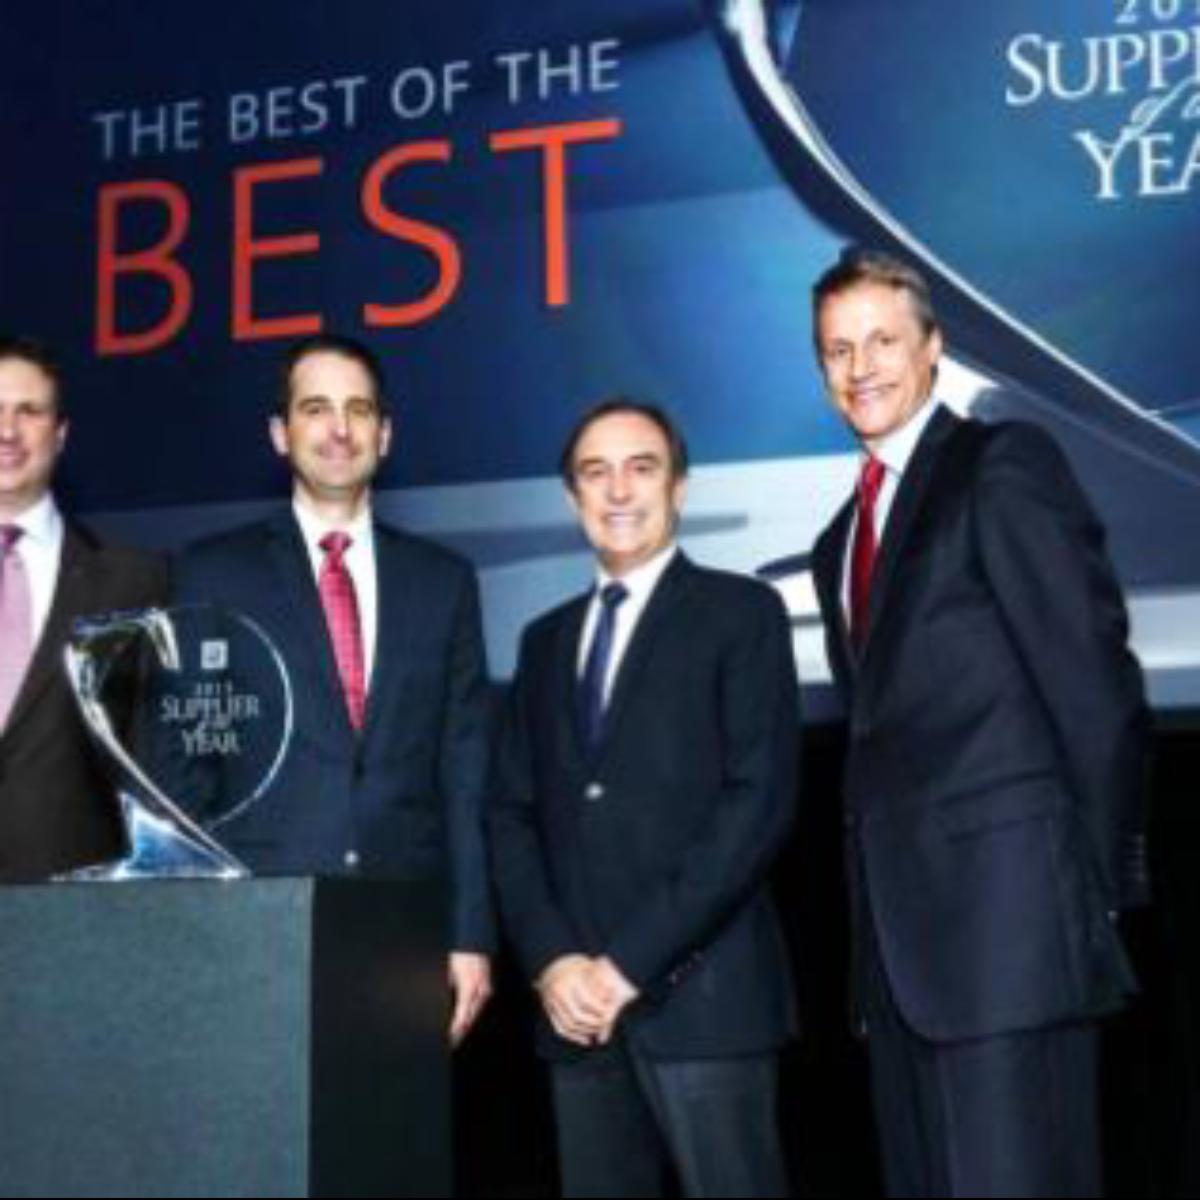 GM supplier awards for NA